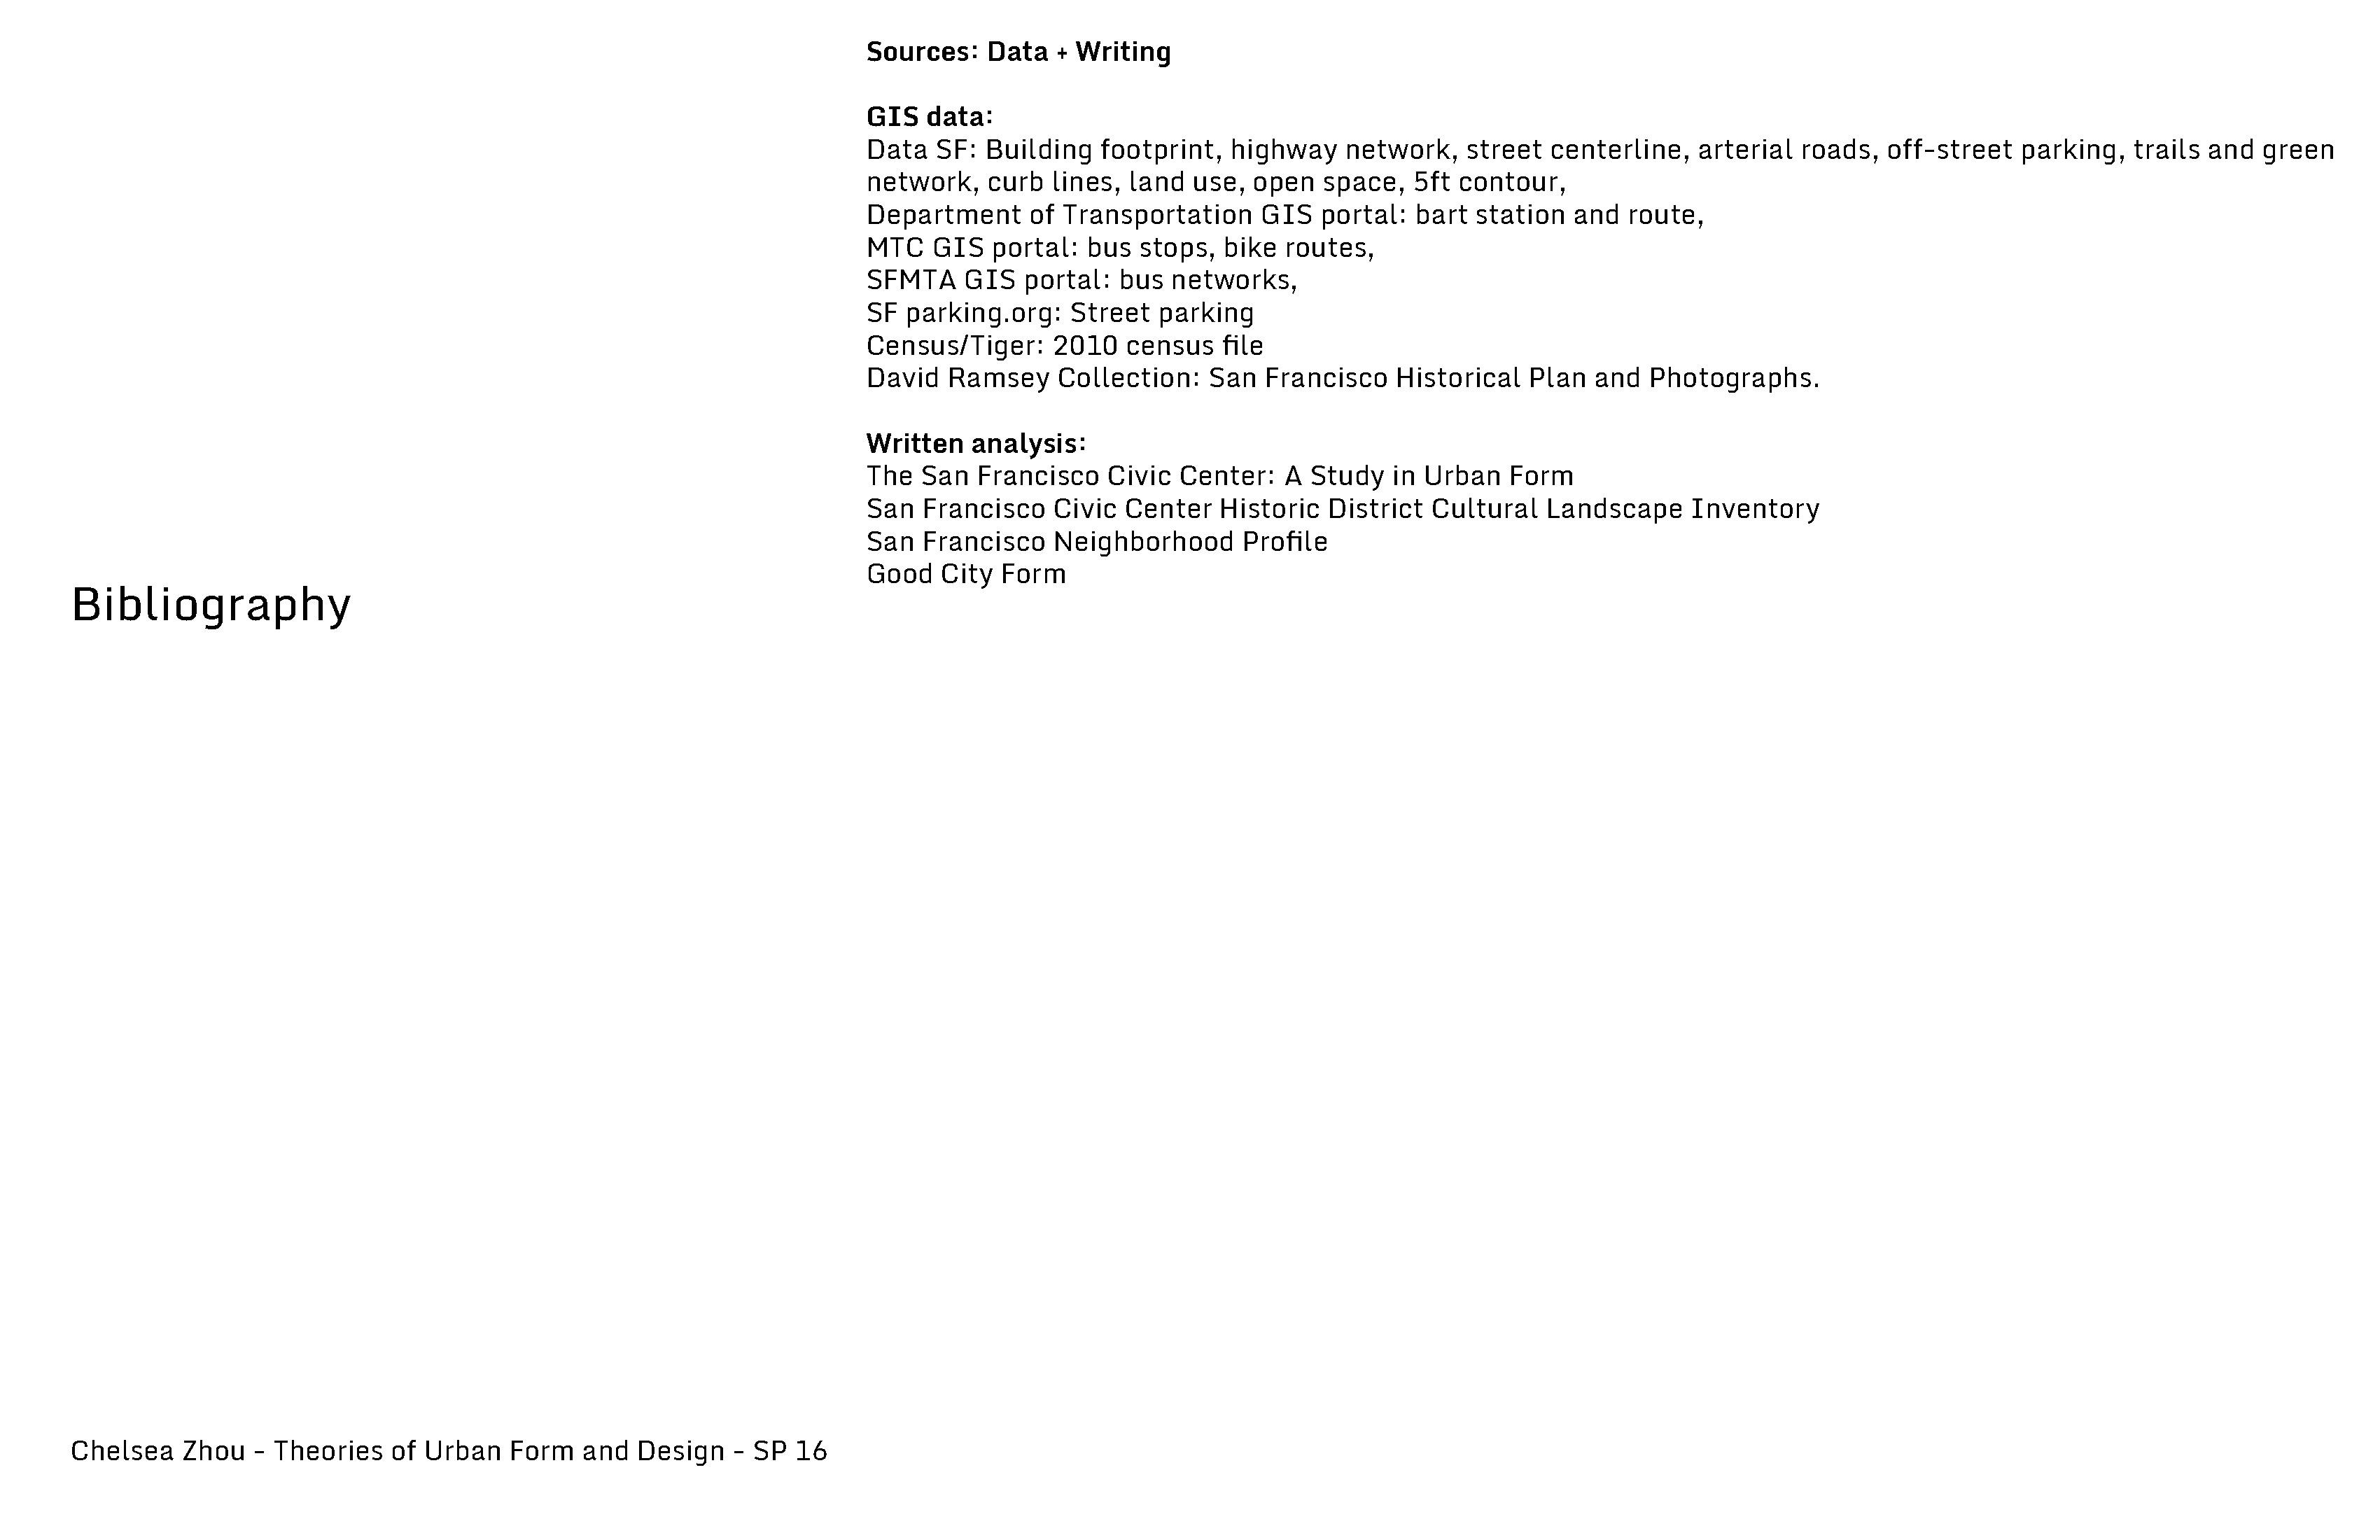 morph analysis cz final_Page_17